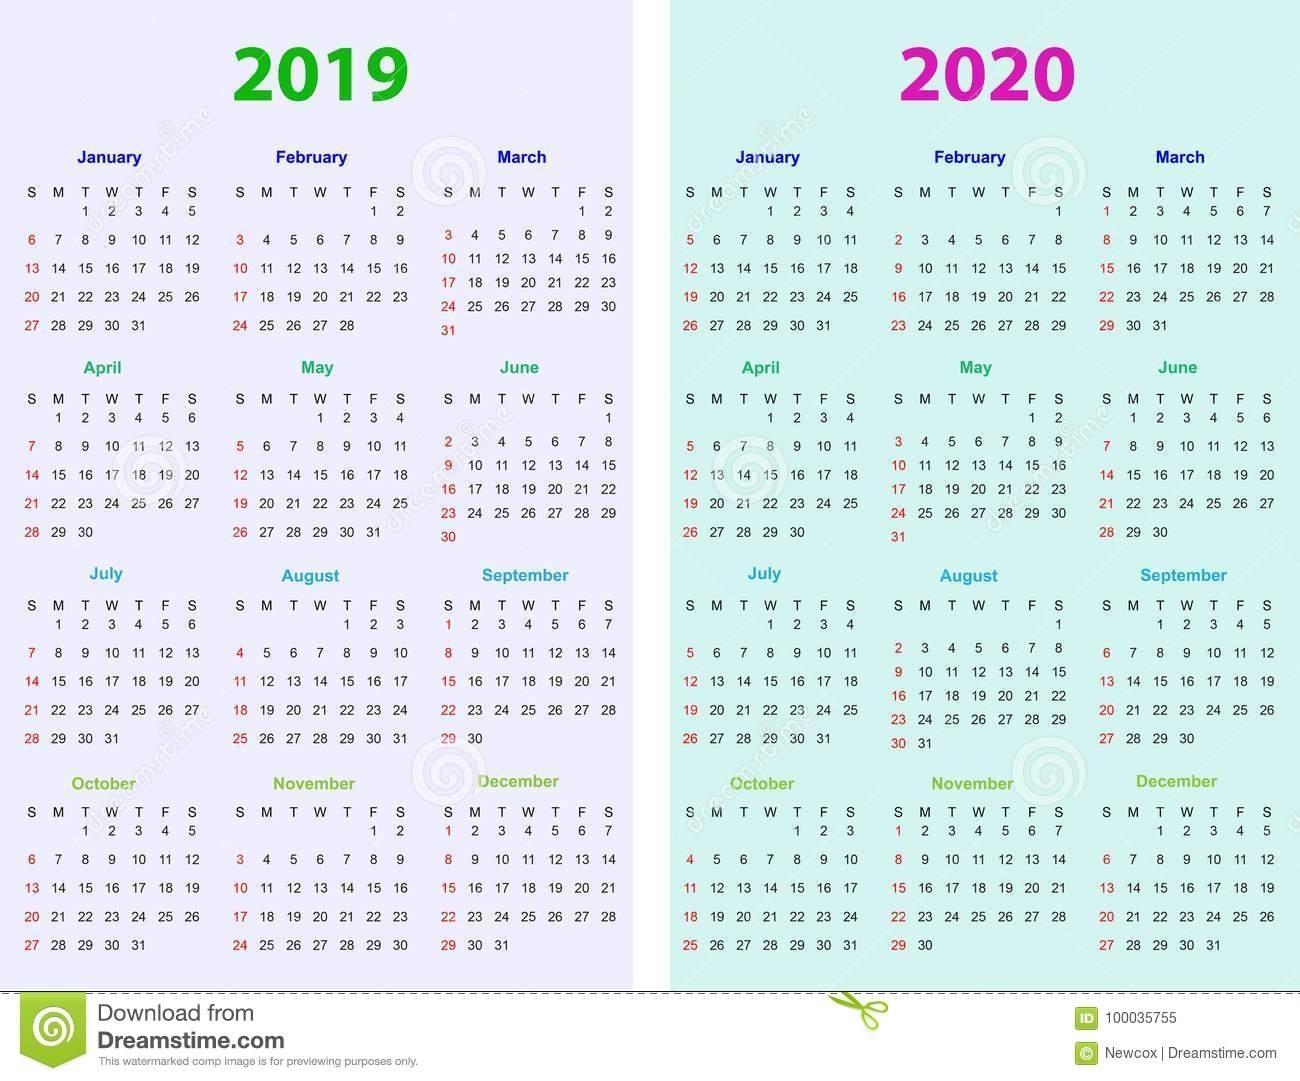 12 Months Calendar Design 2019-2020 Stock Vector - Illustration Of for Printable 8.5 X 11 2020 Calendar